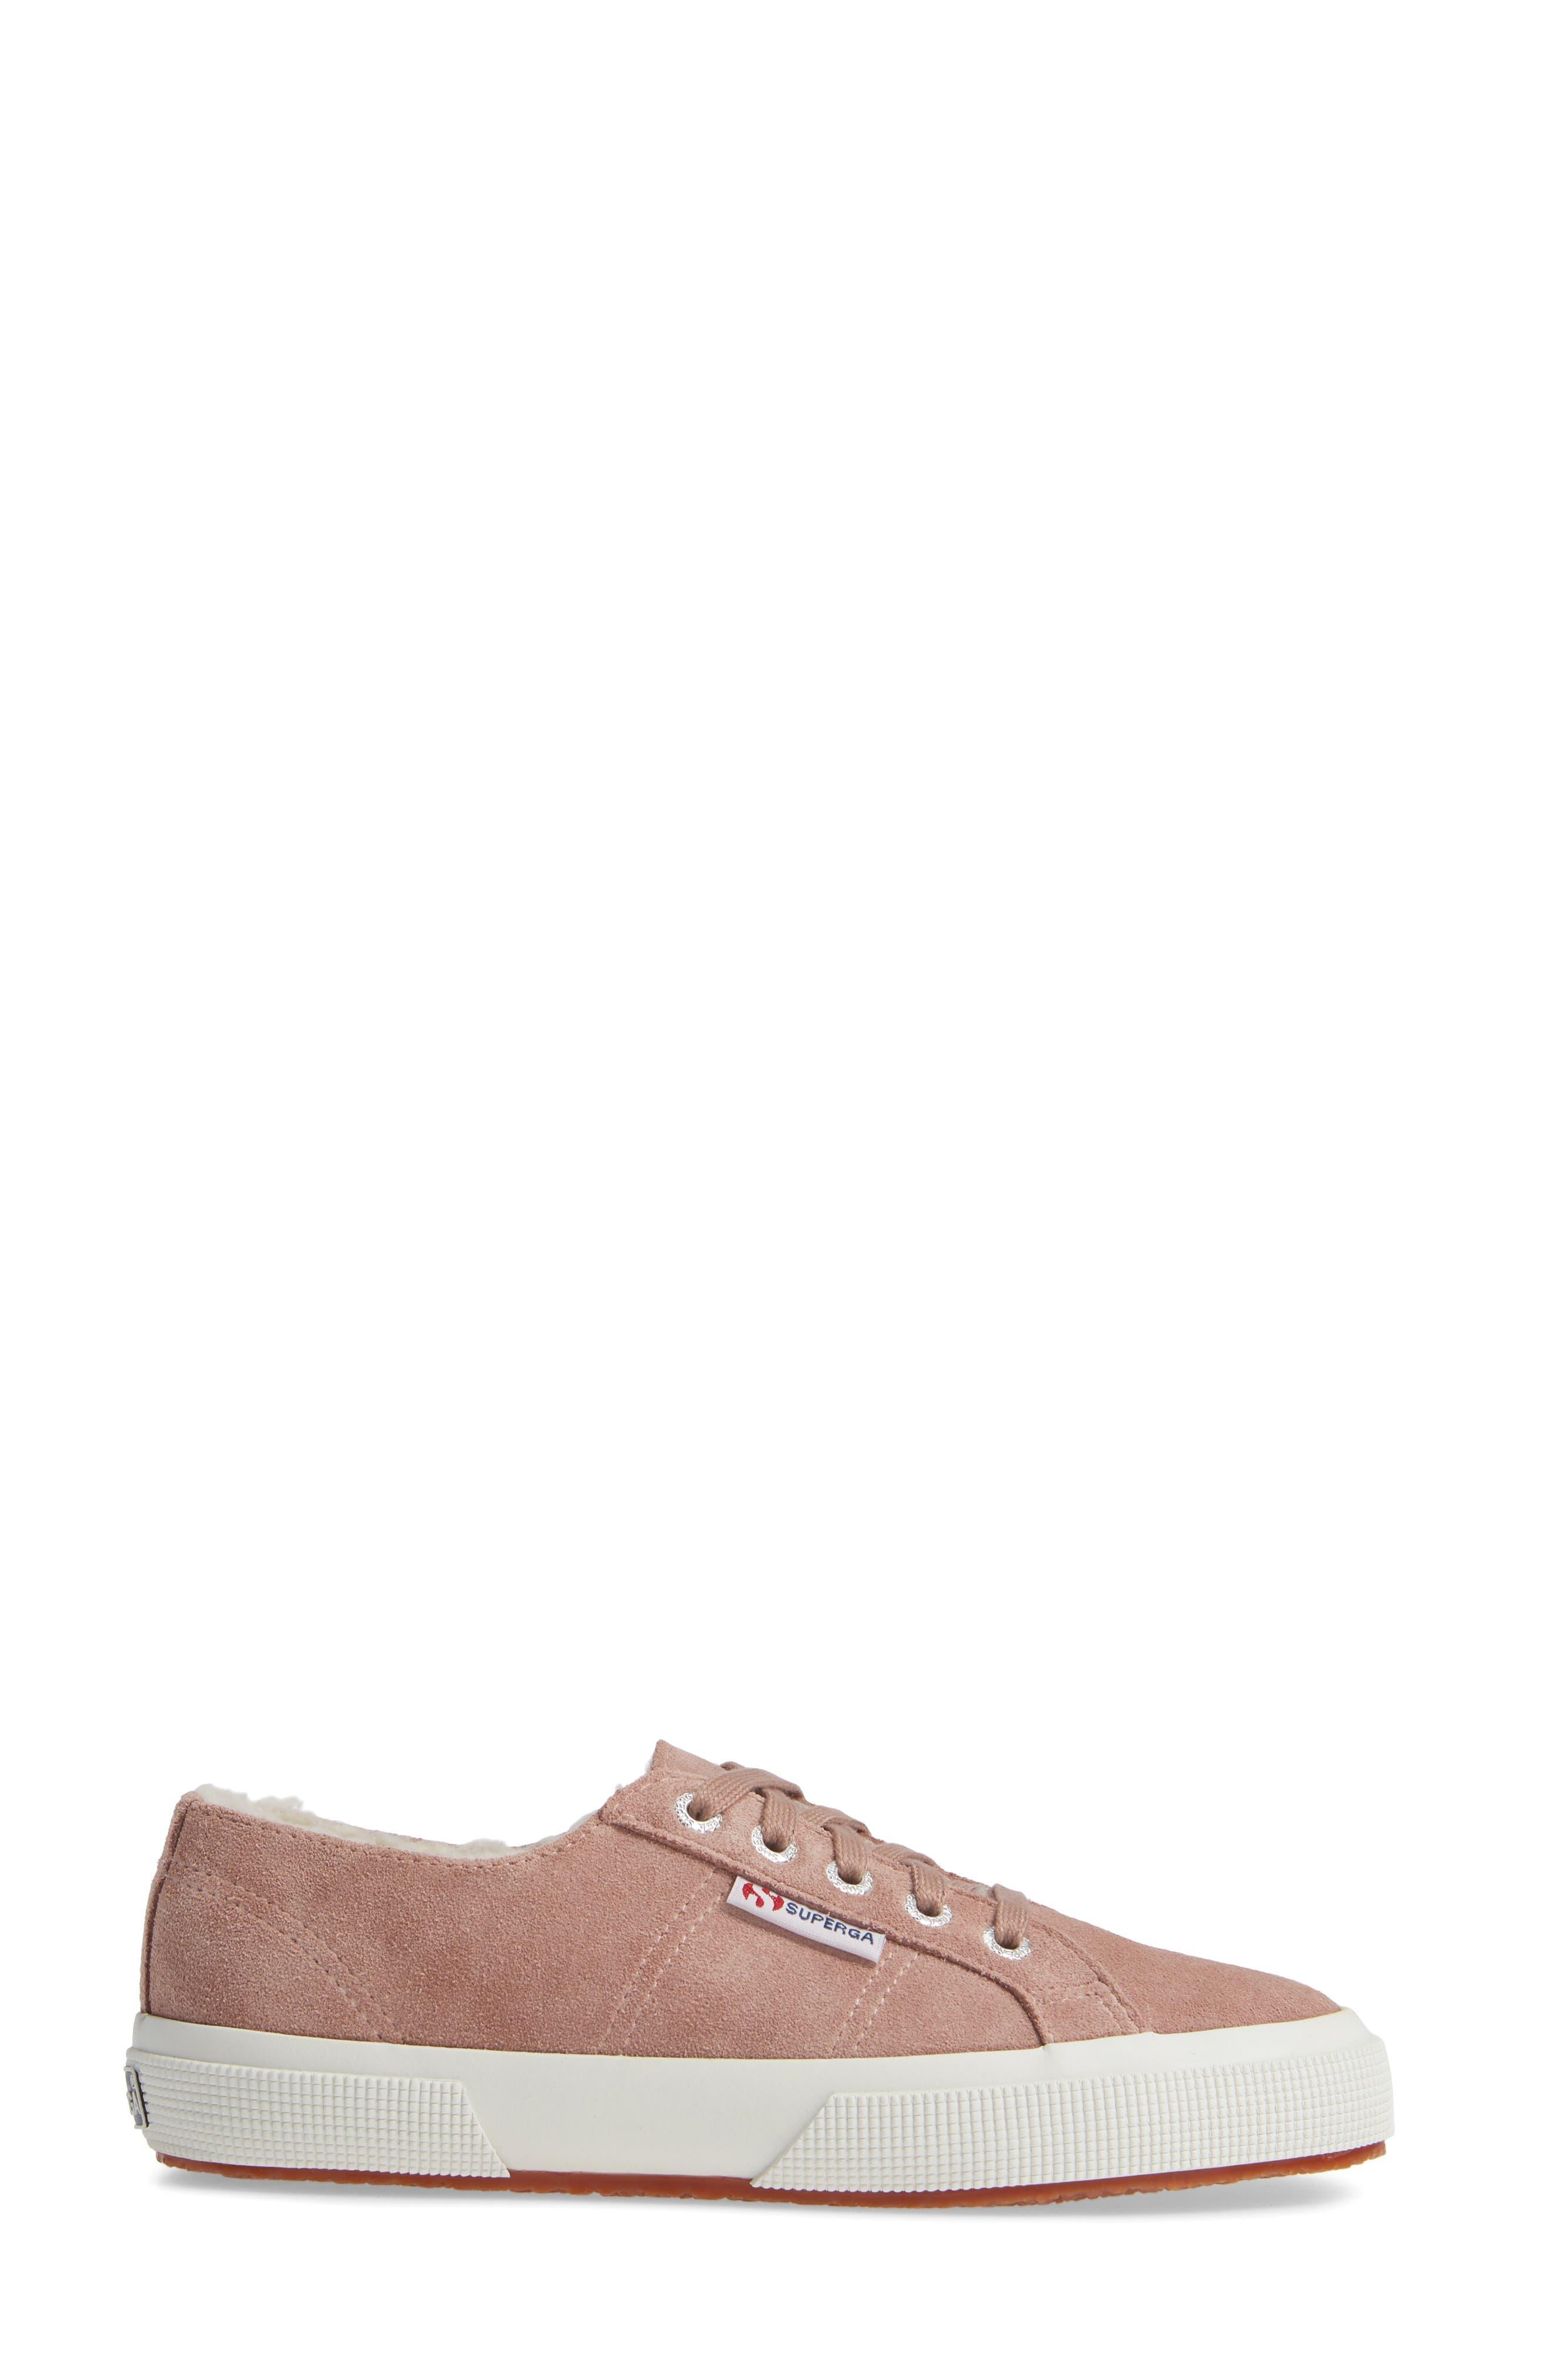 2750 Suefurw Sneaker,                             Alternate thumbnail 3, color,                             ROSE SUEDE